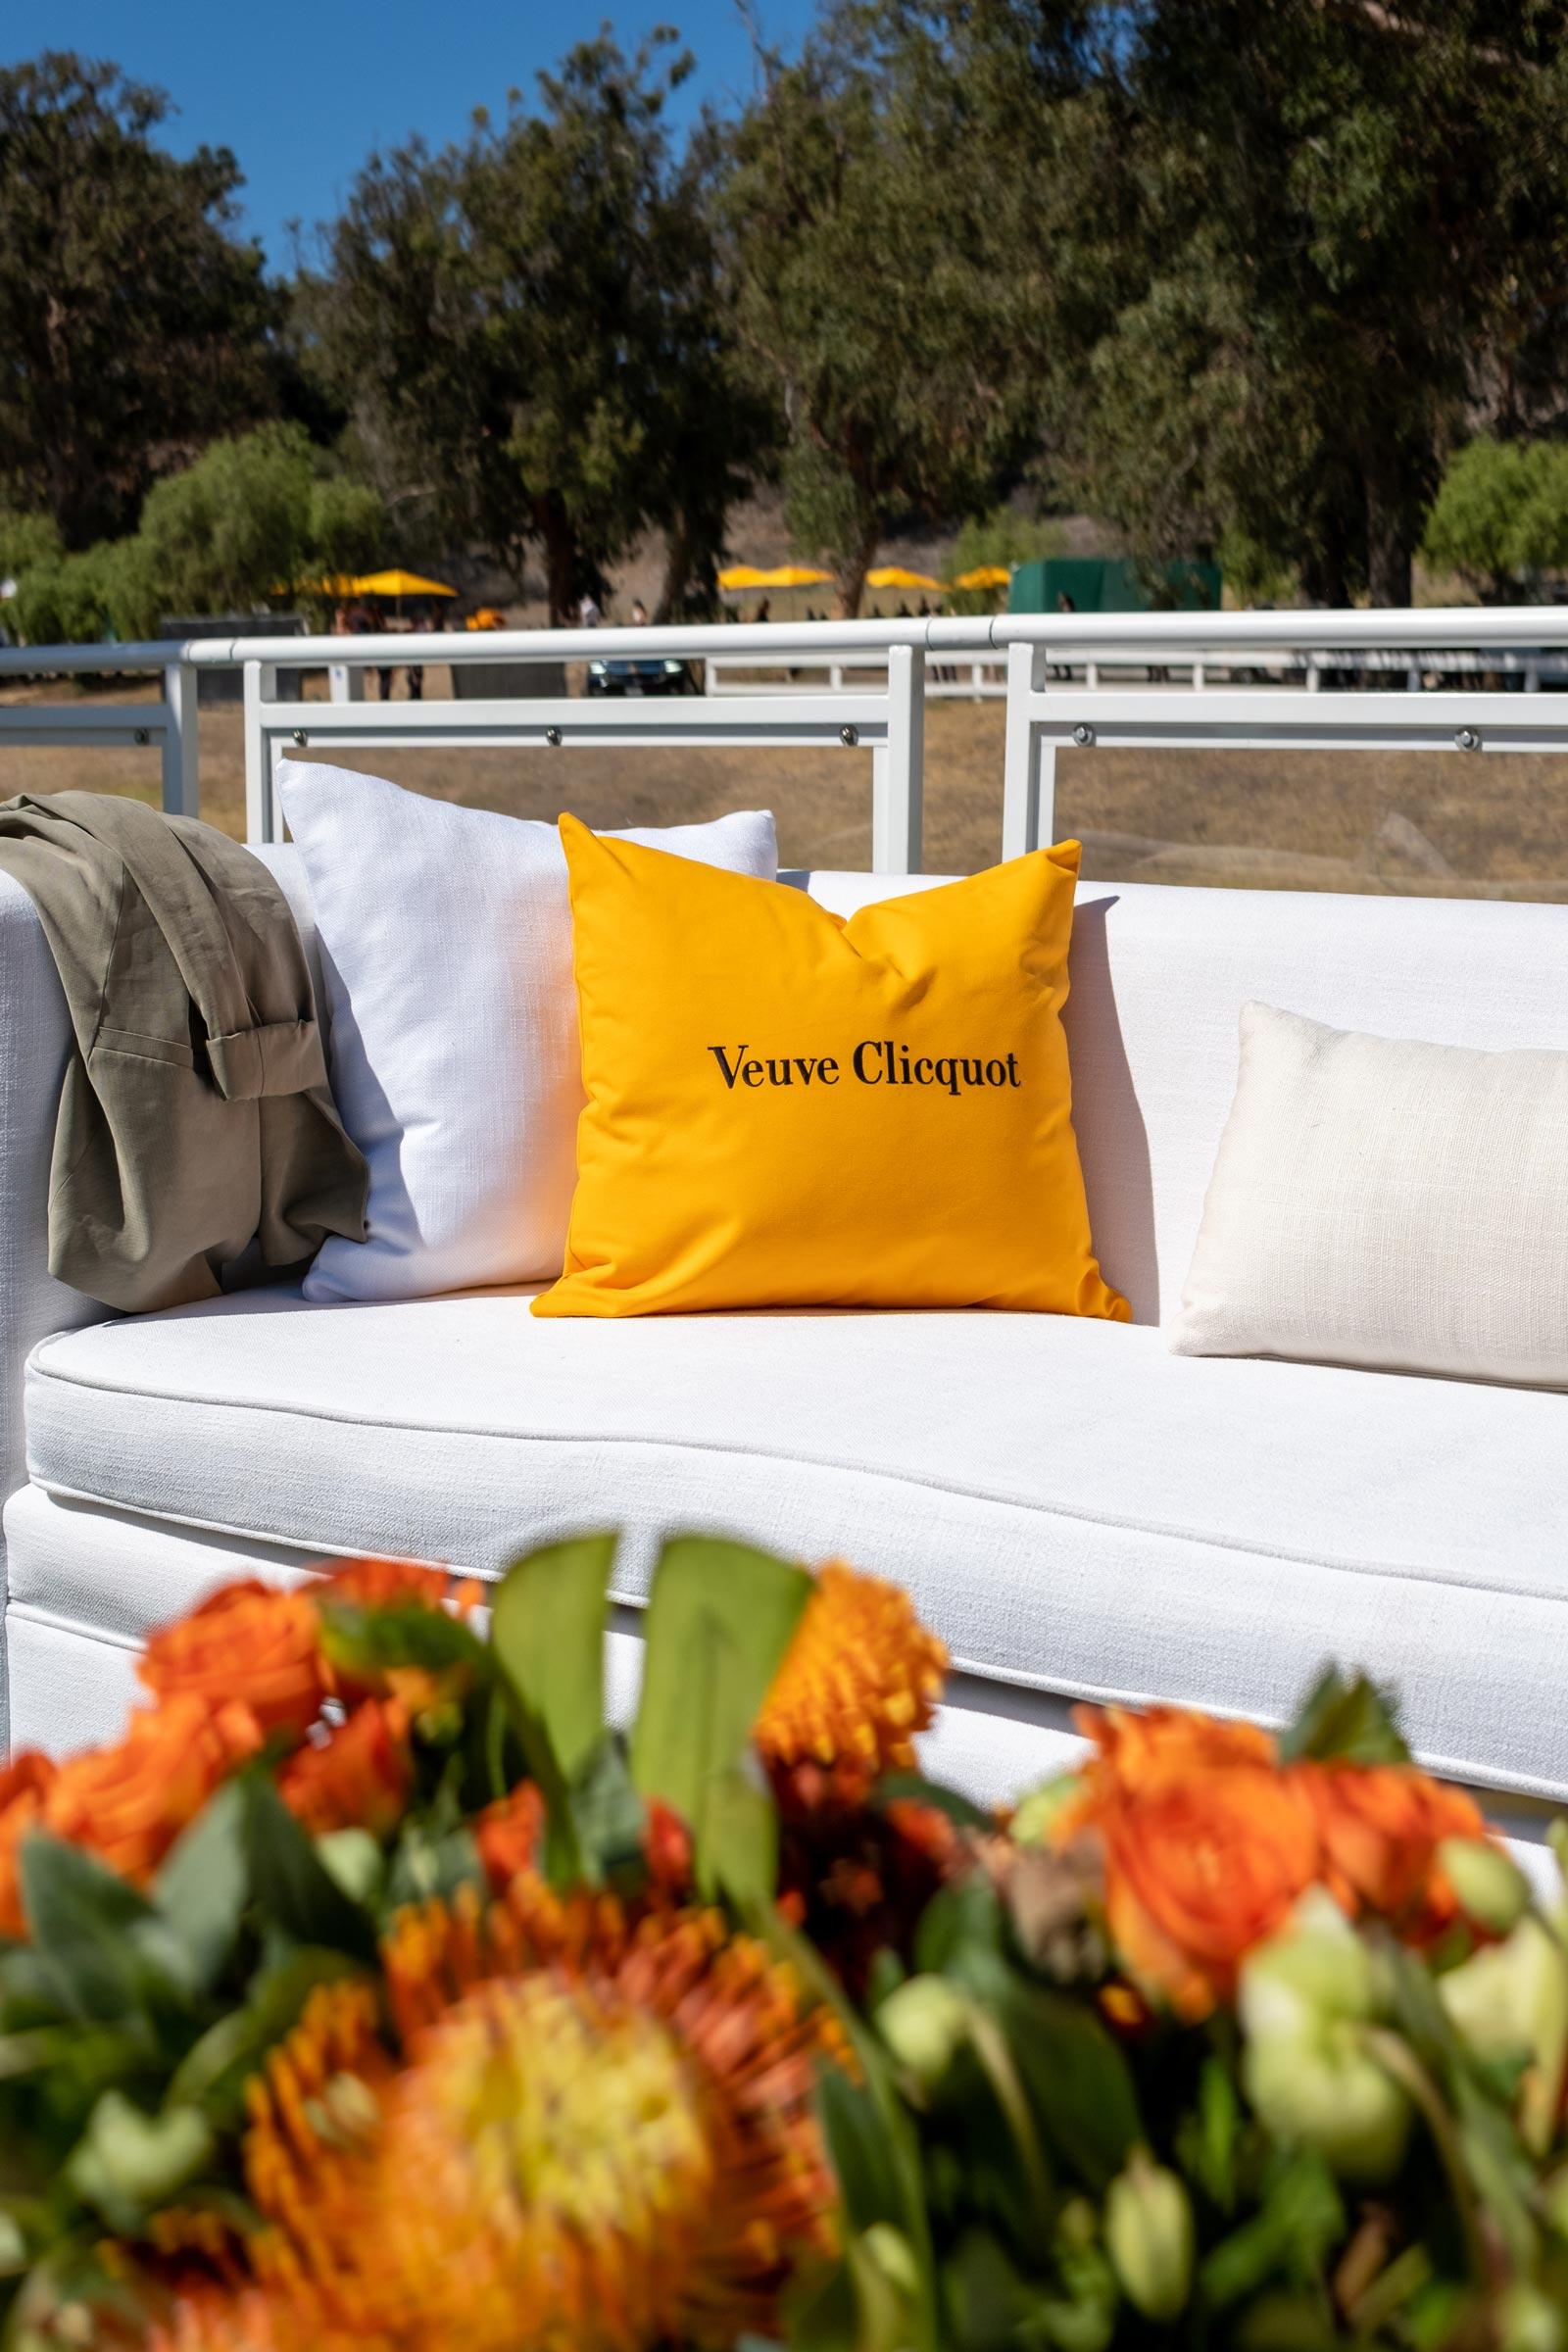 Los Angeles Veuve Clicquot